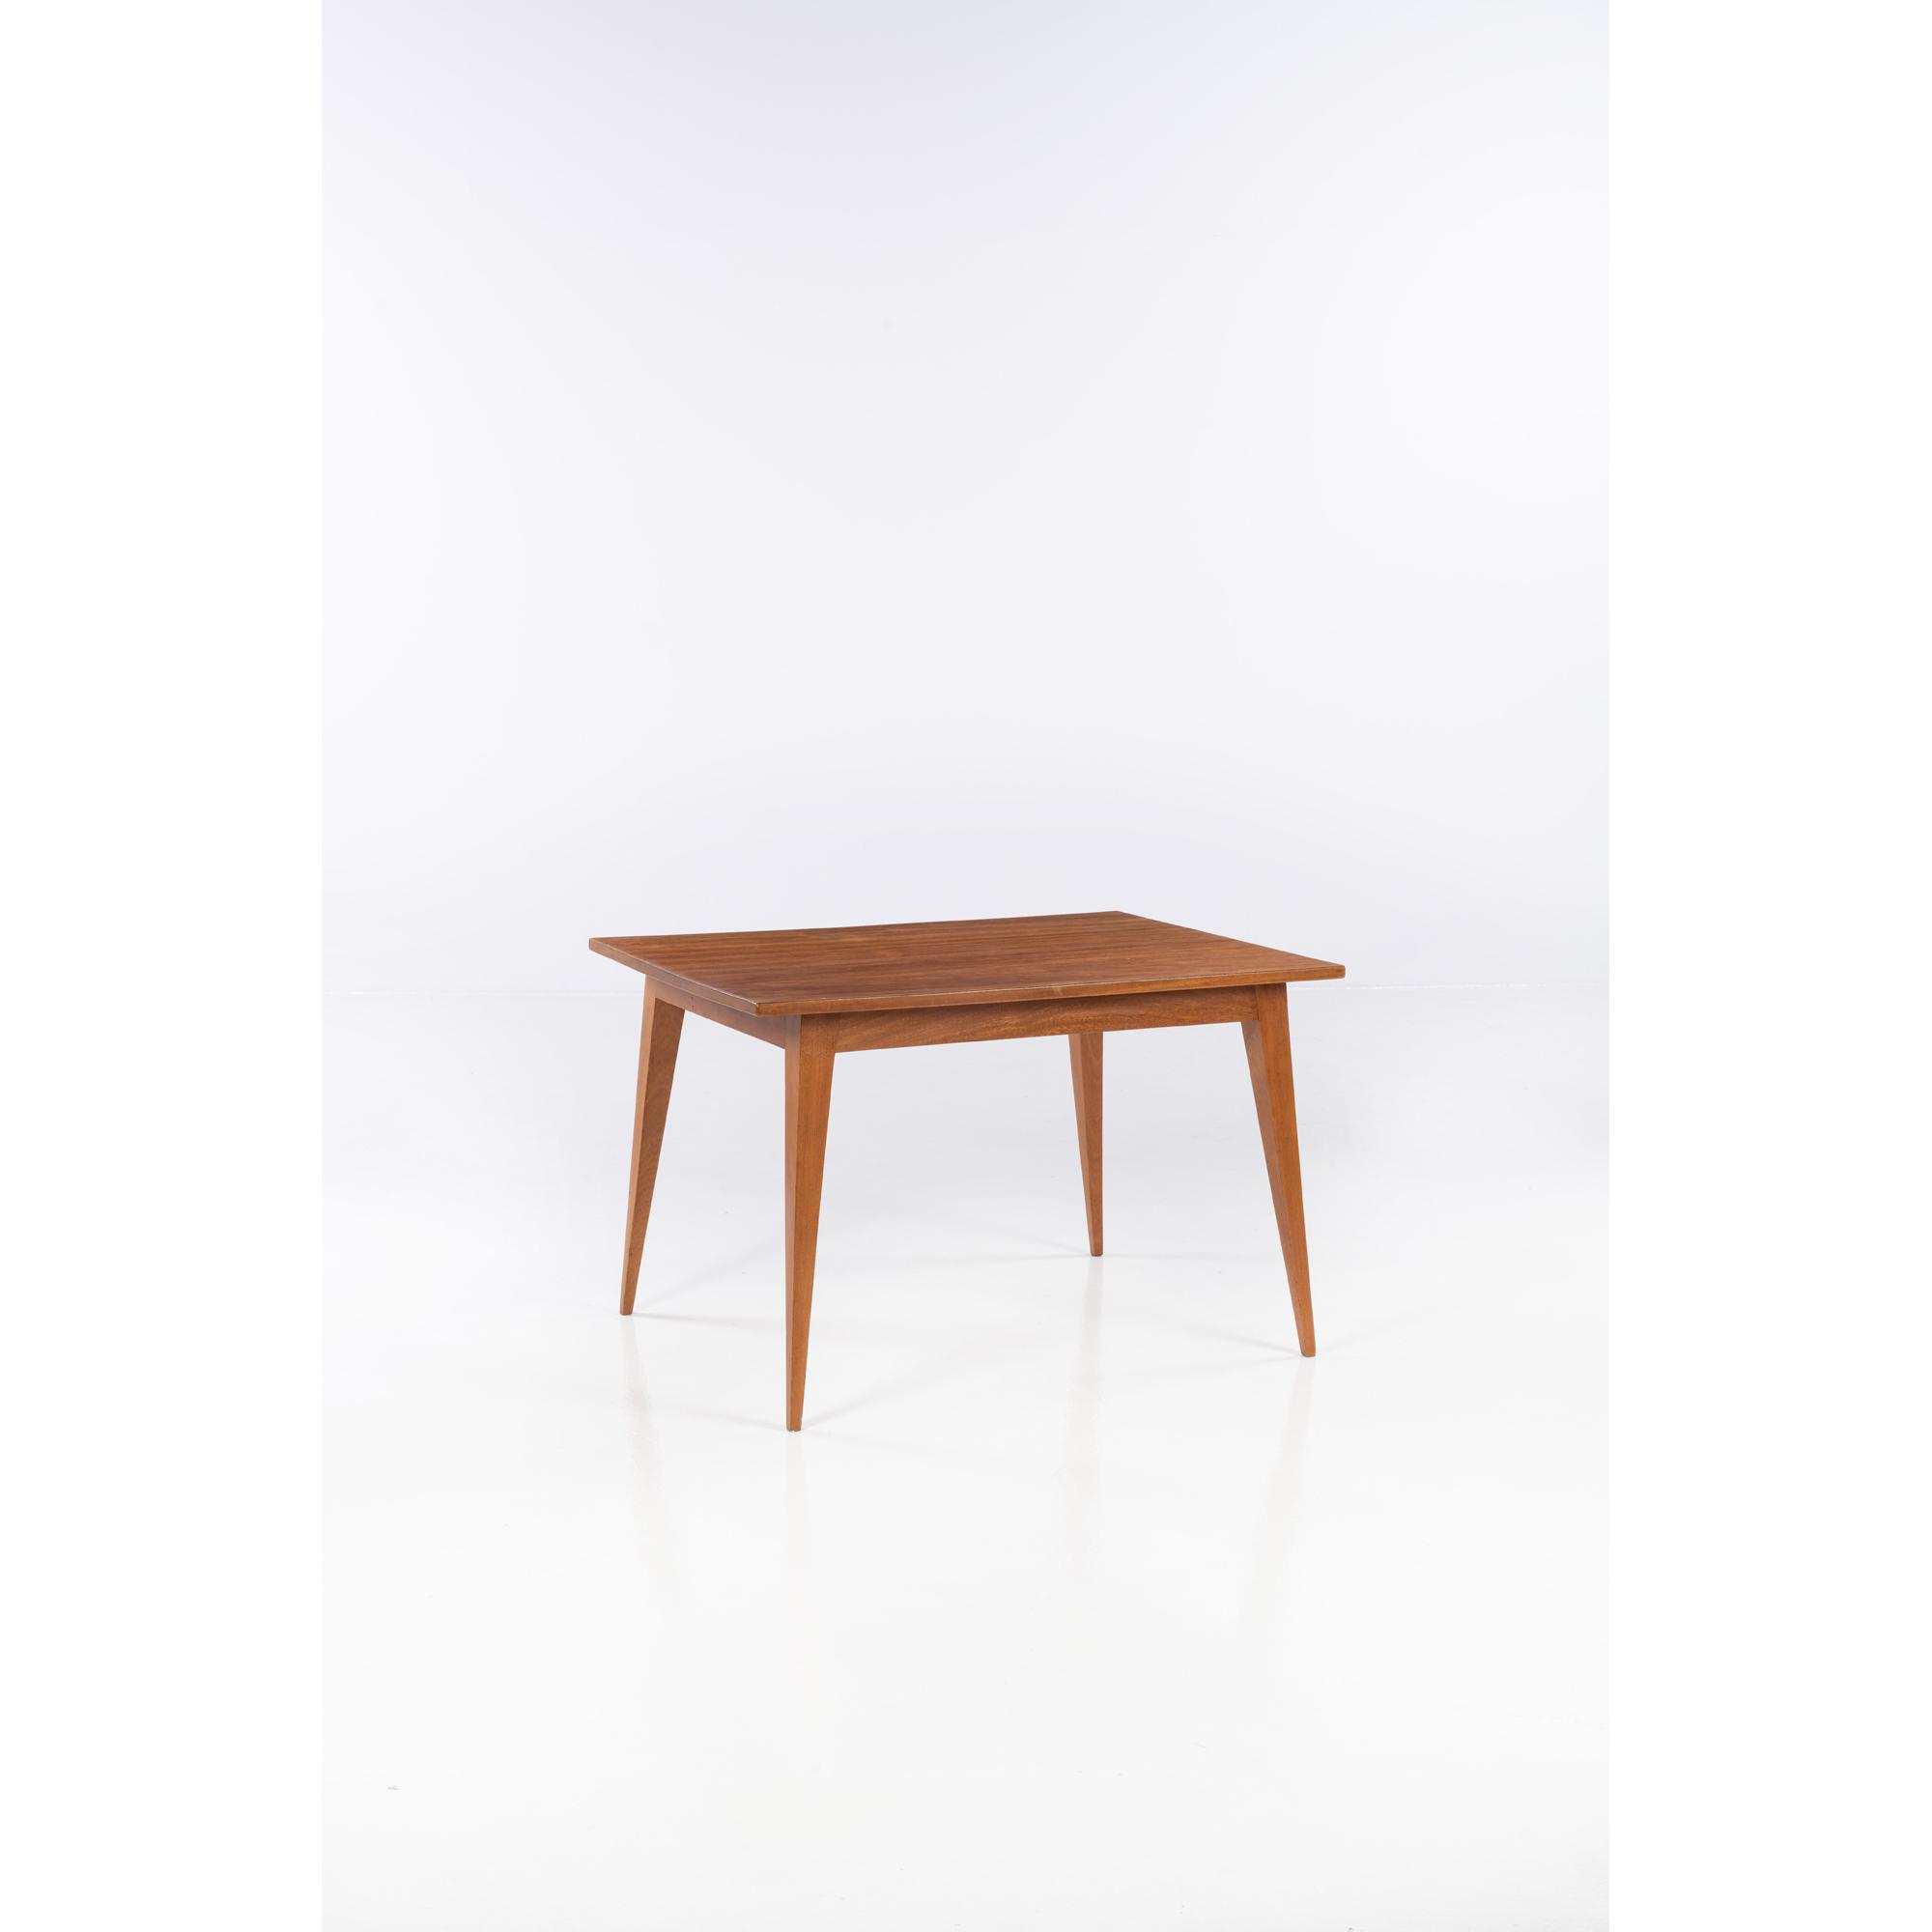 ƒ Joaquim Tenreiro (1906-1992) Table de salle à manger